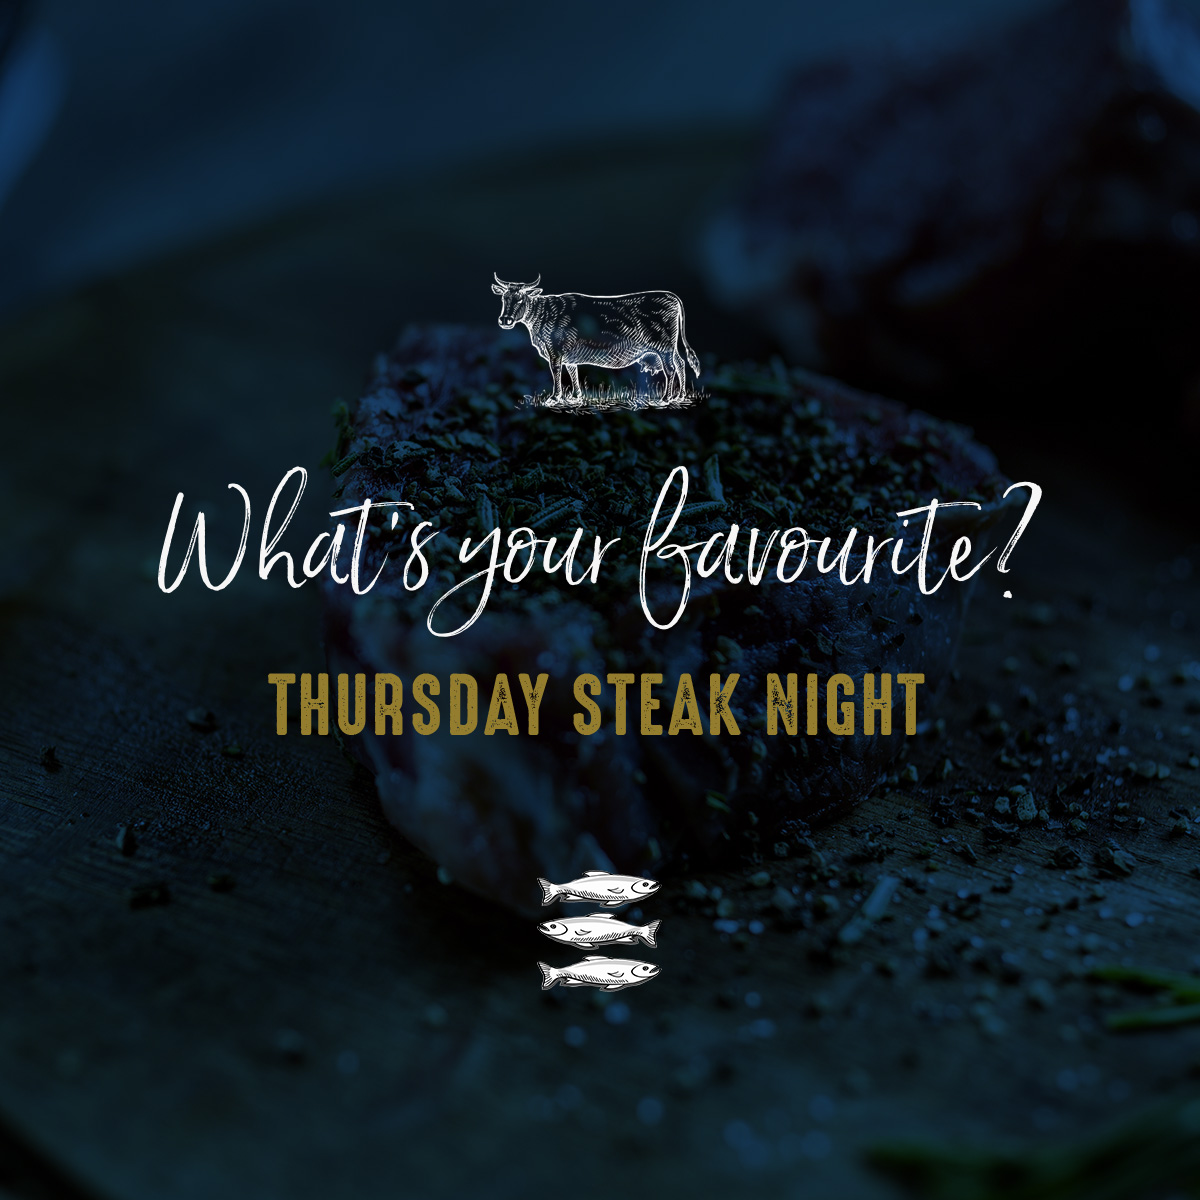 steaknight-image1